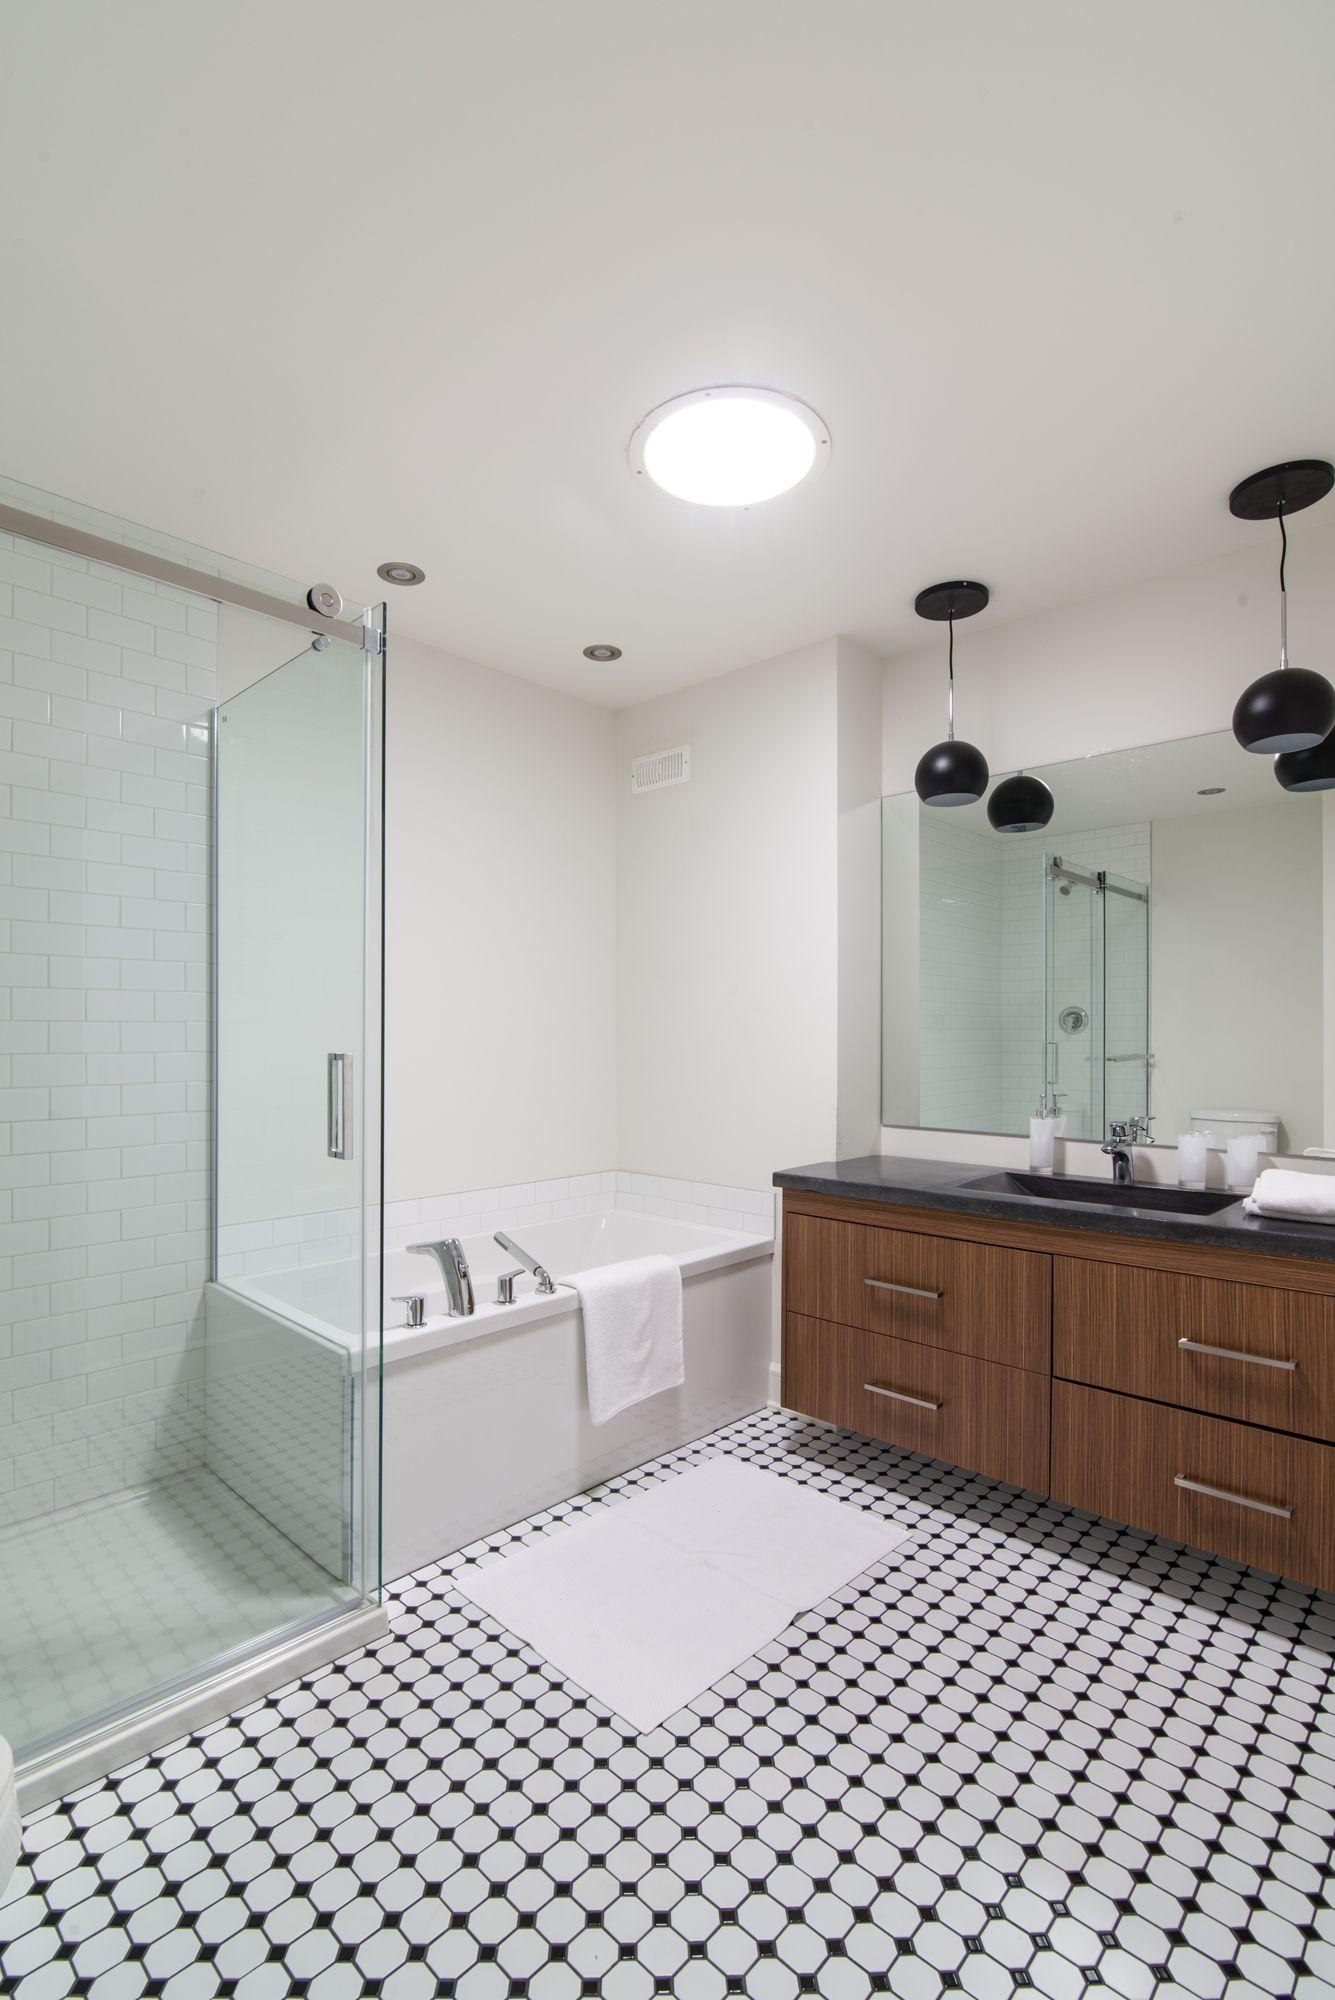 Lapeyre Salle De Bain Vasque ~ Salle De Bain Bathroom Bathtub Bain Shower Bath Counter Puit